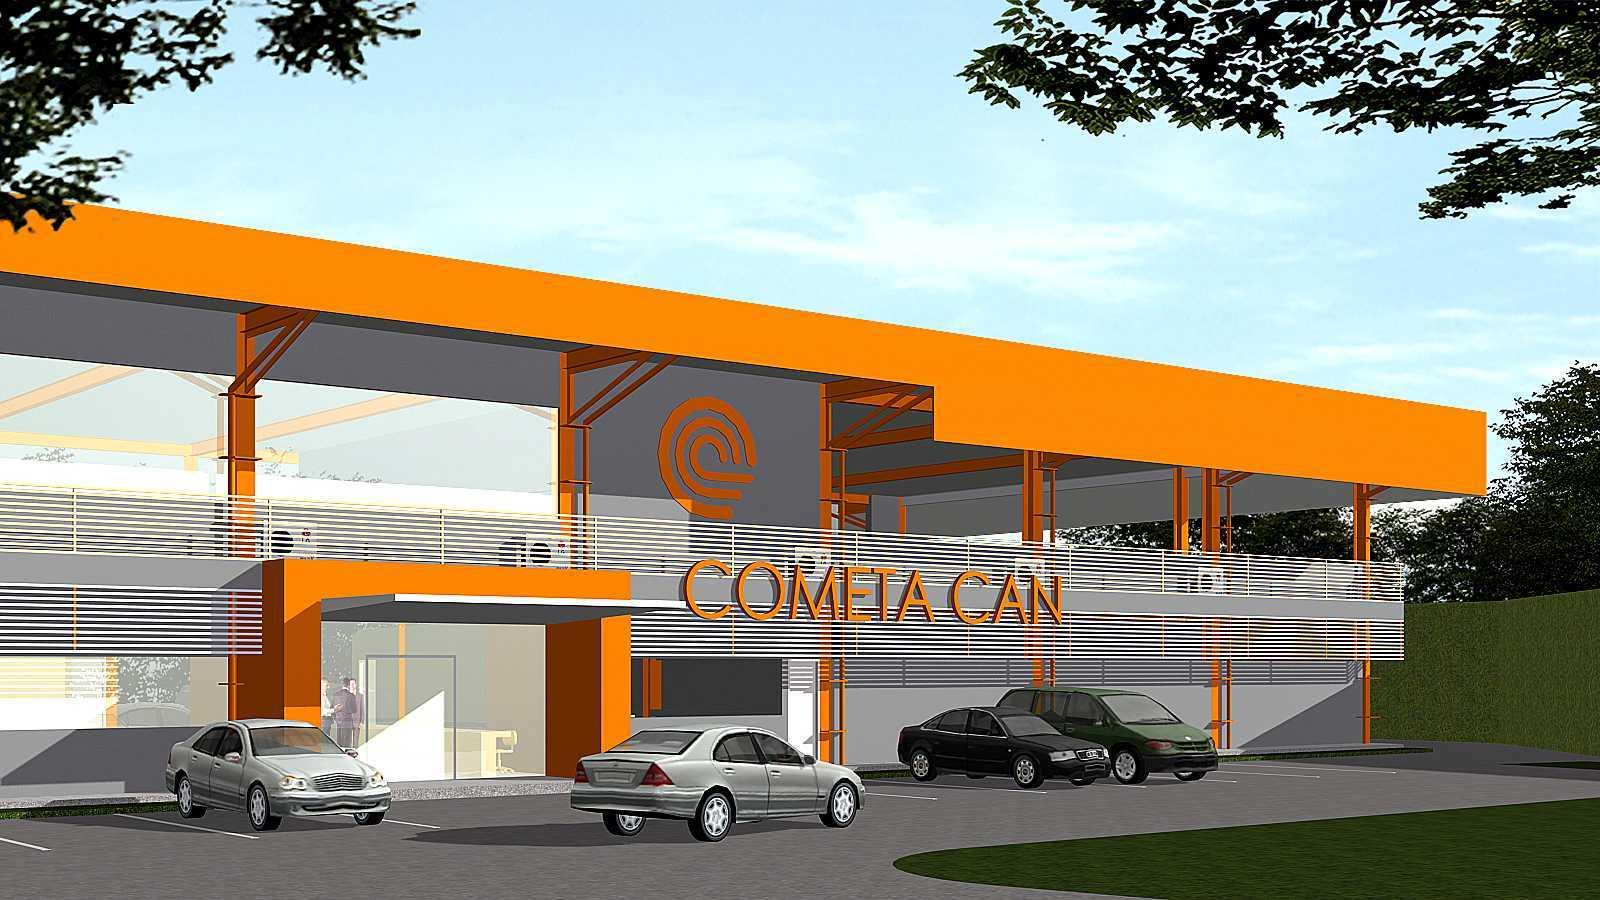 Pt.  Atelier Una Indonesia Cometa Office  Bitung, Kota Bitung, Sulawesi Utara, Indonesia Bitung, Kota Bitung, Sulawesi Utara, Indonesia Pt-Atelier-Una-Indonesia-Cometa-Office-   57925